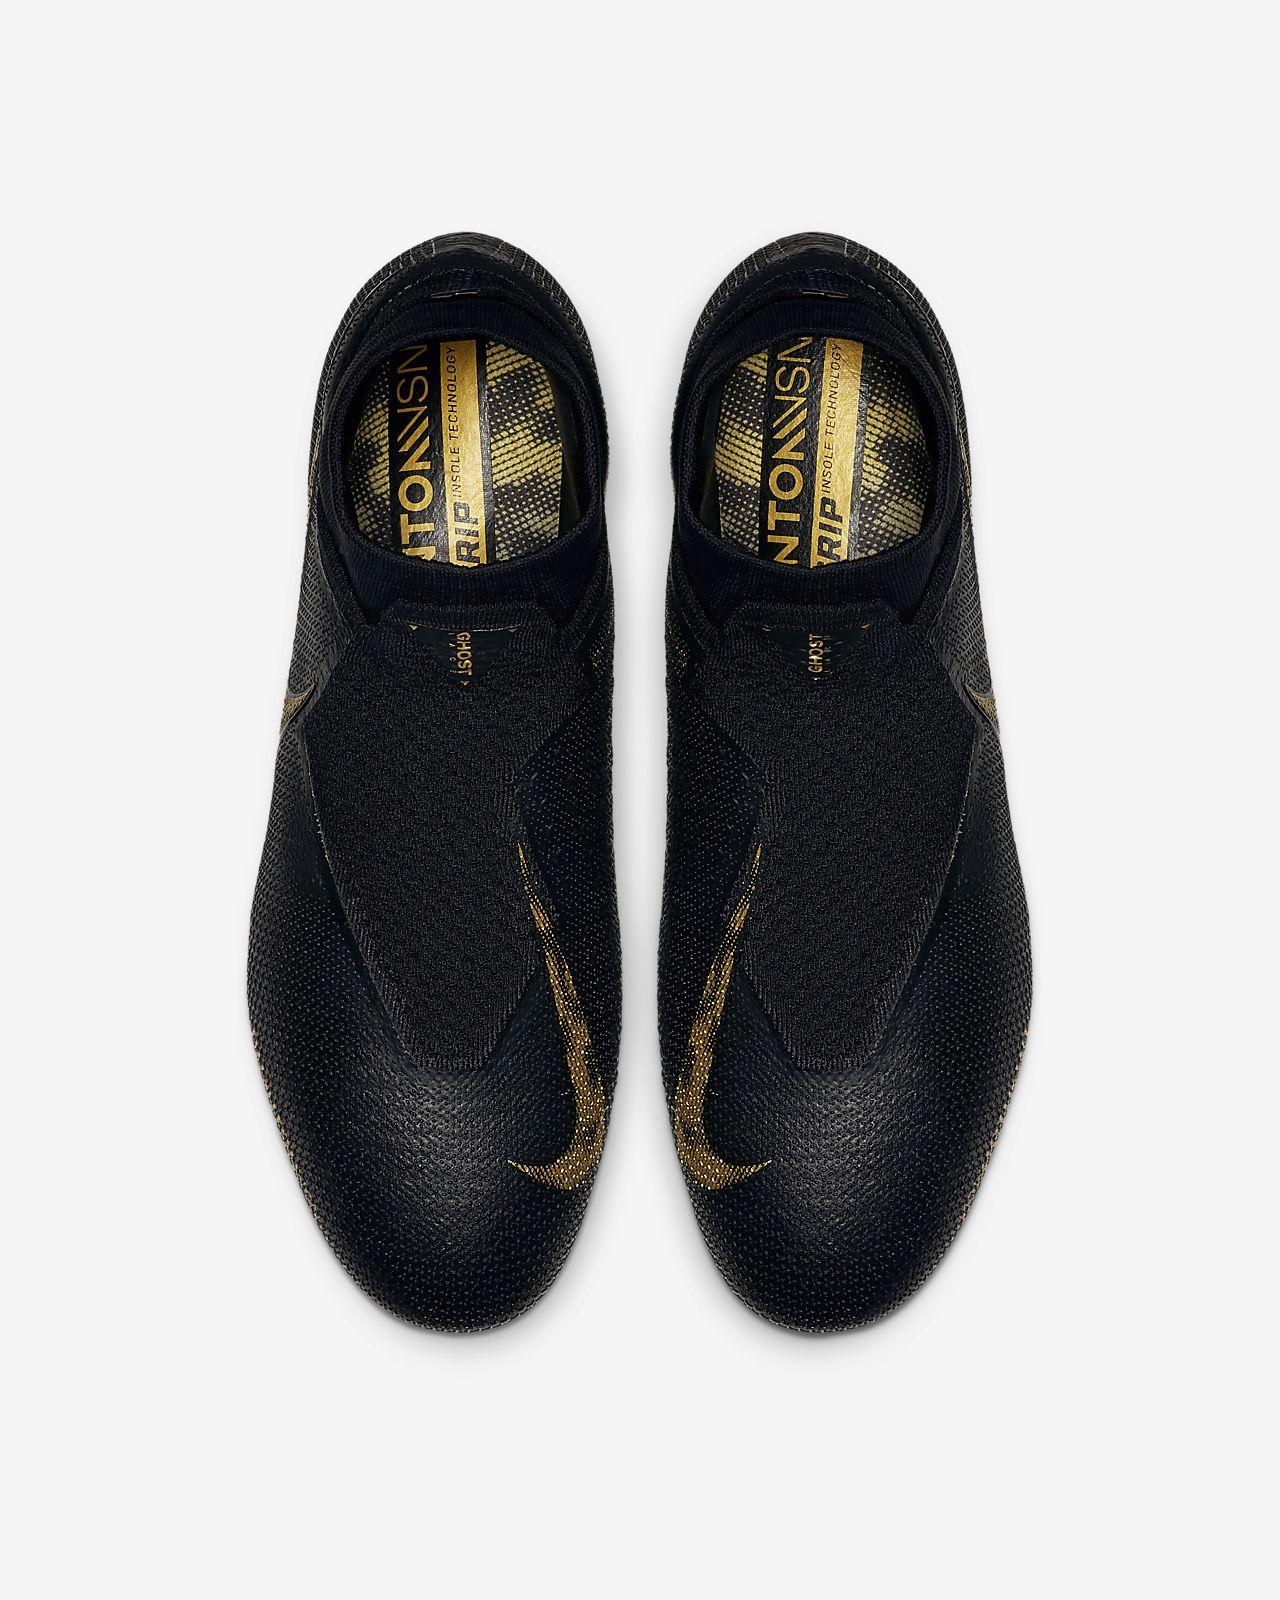 cc7efc9980bf1 ... Chuteiras de futebol Nike Phantom Vision Elite Dynamic Fit Anti-Clog  SG-PRO